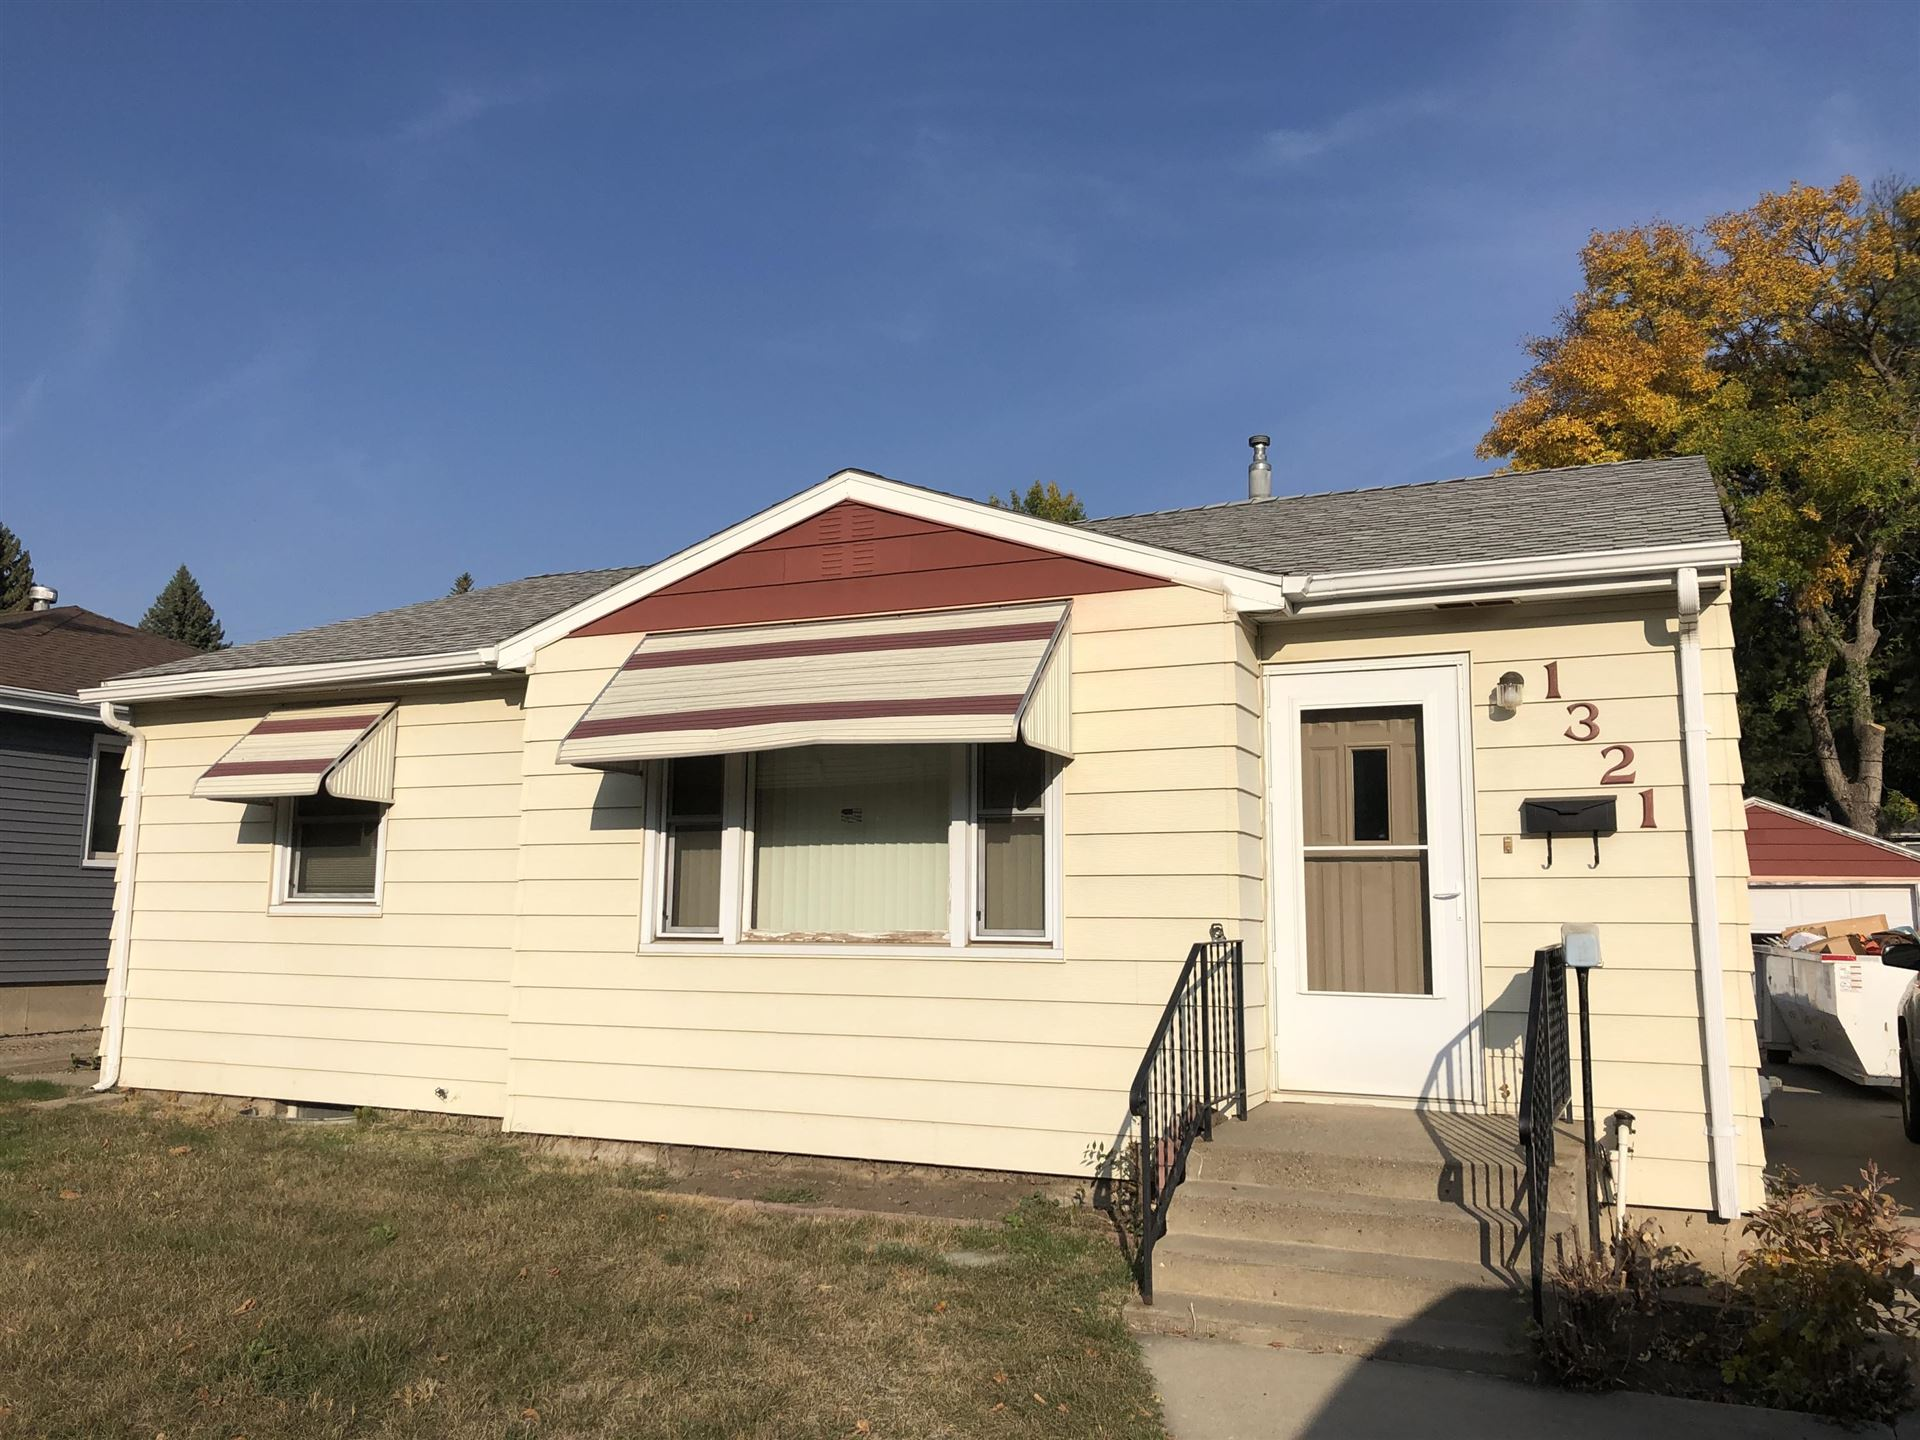 1321 16th Street, Bismarck, ND 58501 - #: 408560